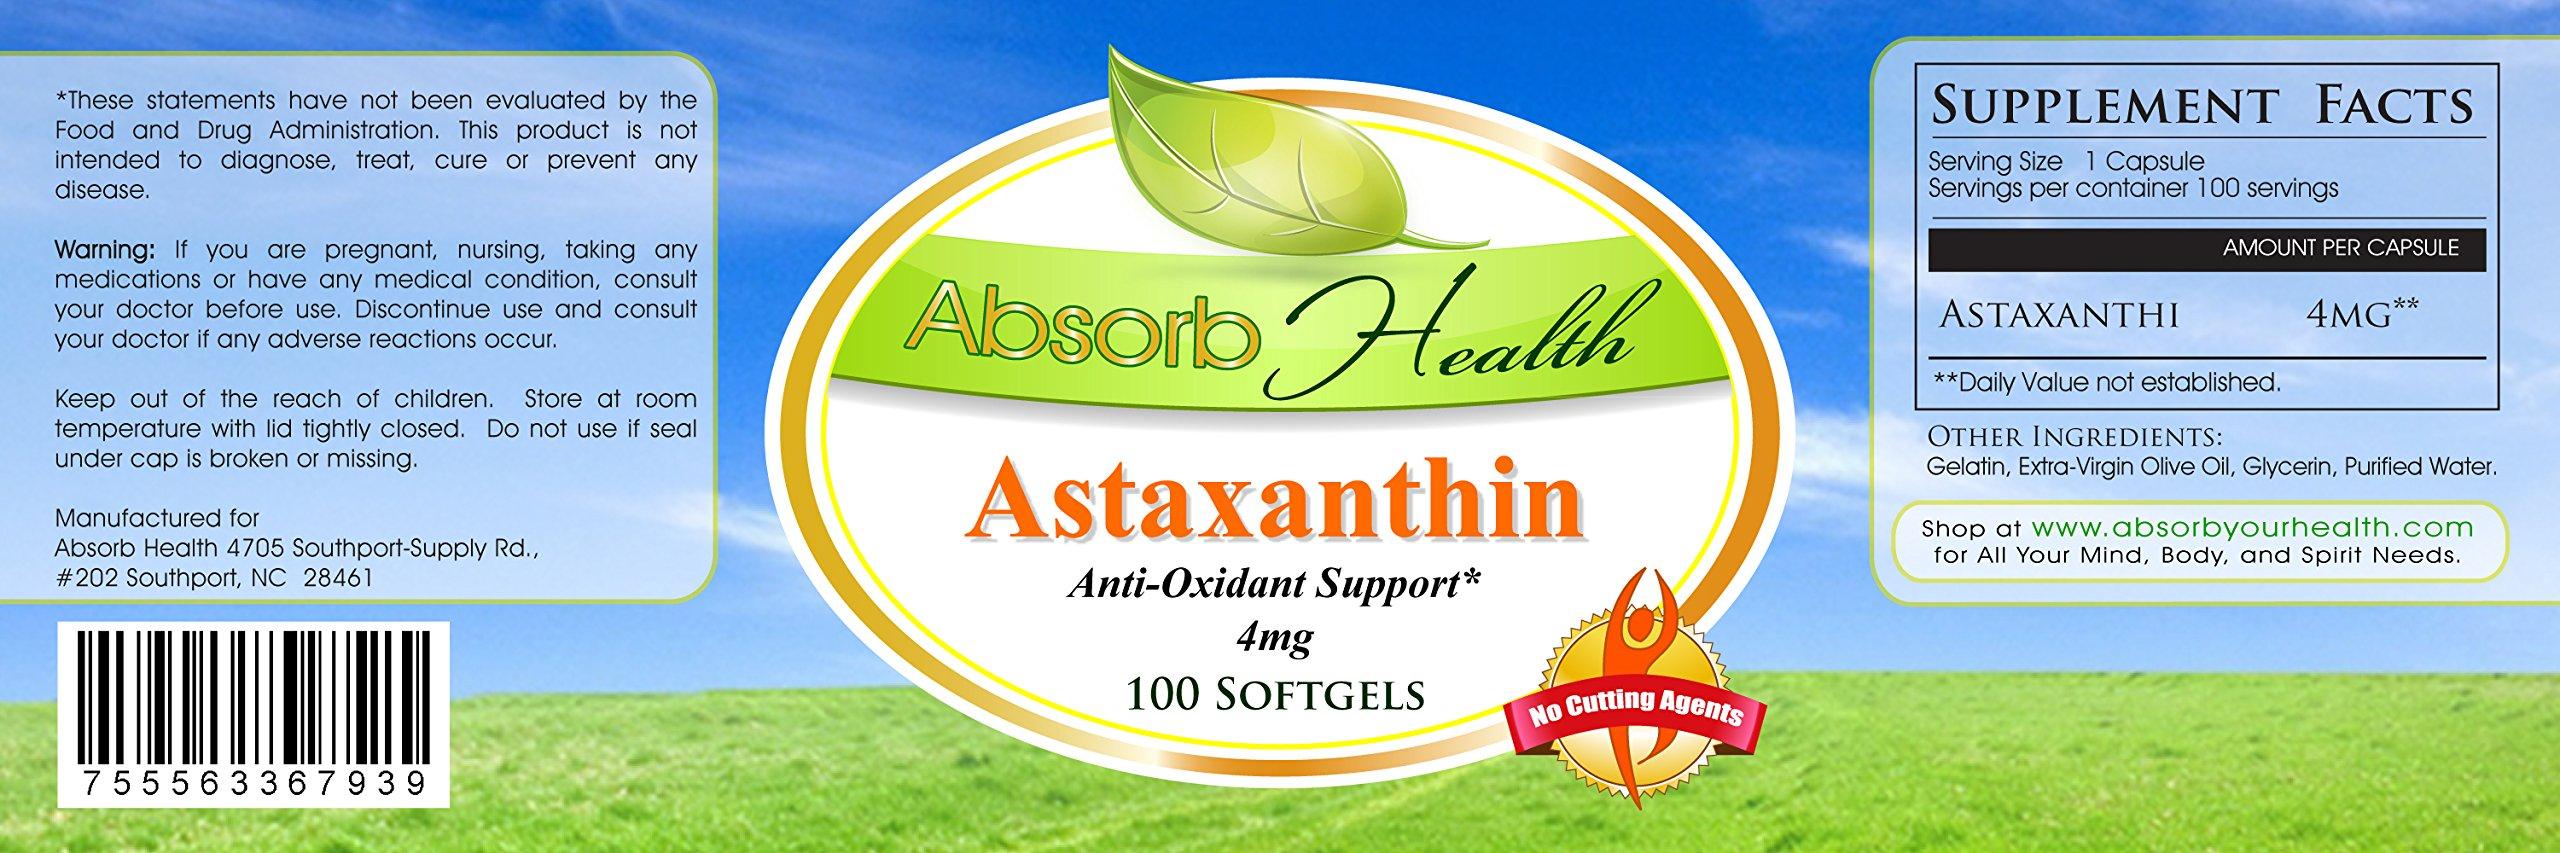 Astaxanthin | 100 Softgels 4mg | Powerful Antioxidant | Powerful Immune Booster